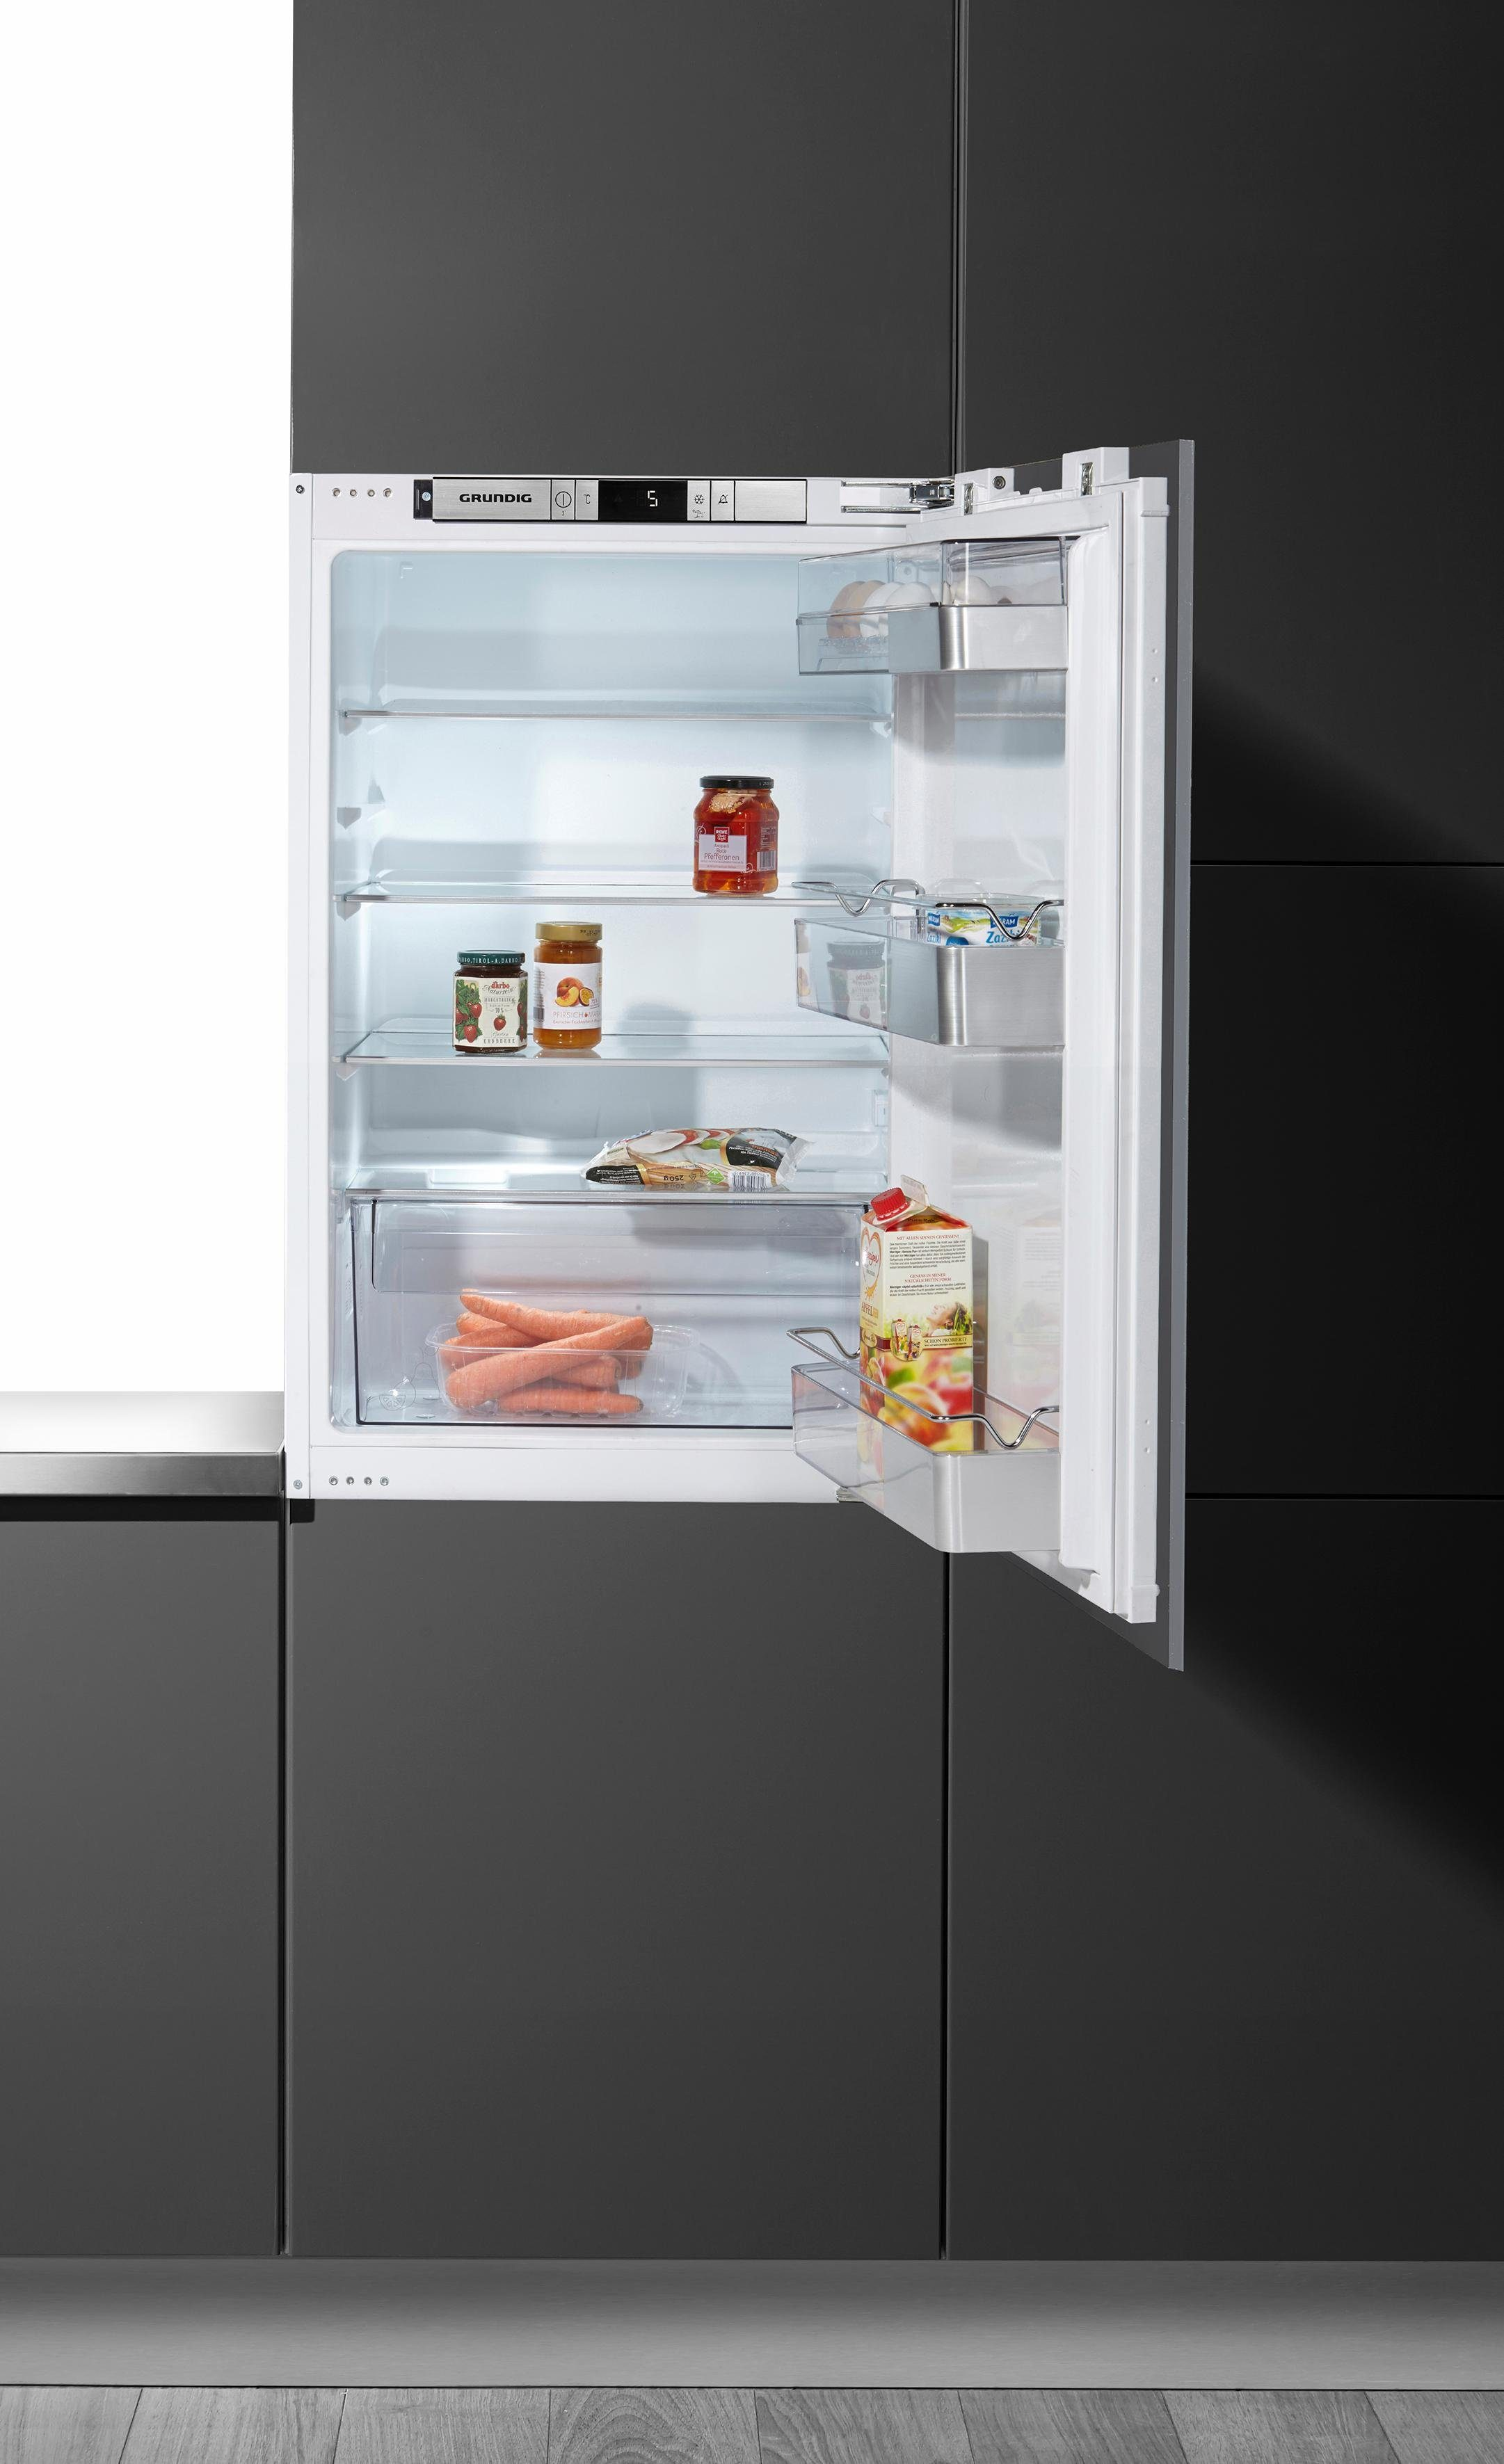 Grundig integrierbarer Einbaukühlschrank GTMI 10120, A++, 87,6 cm